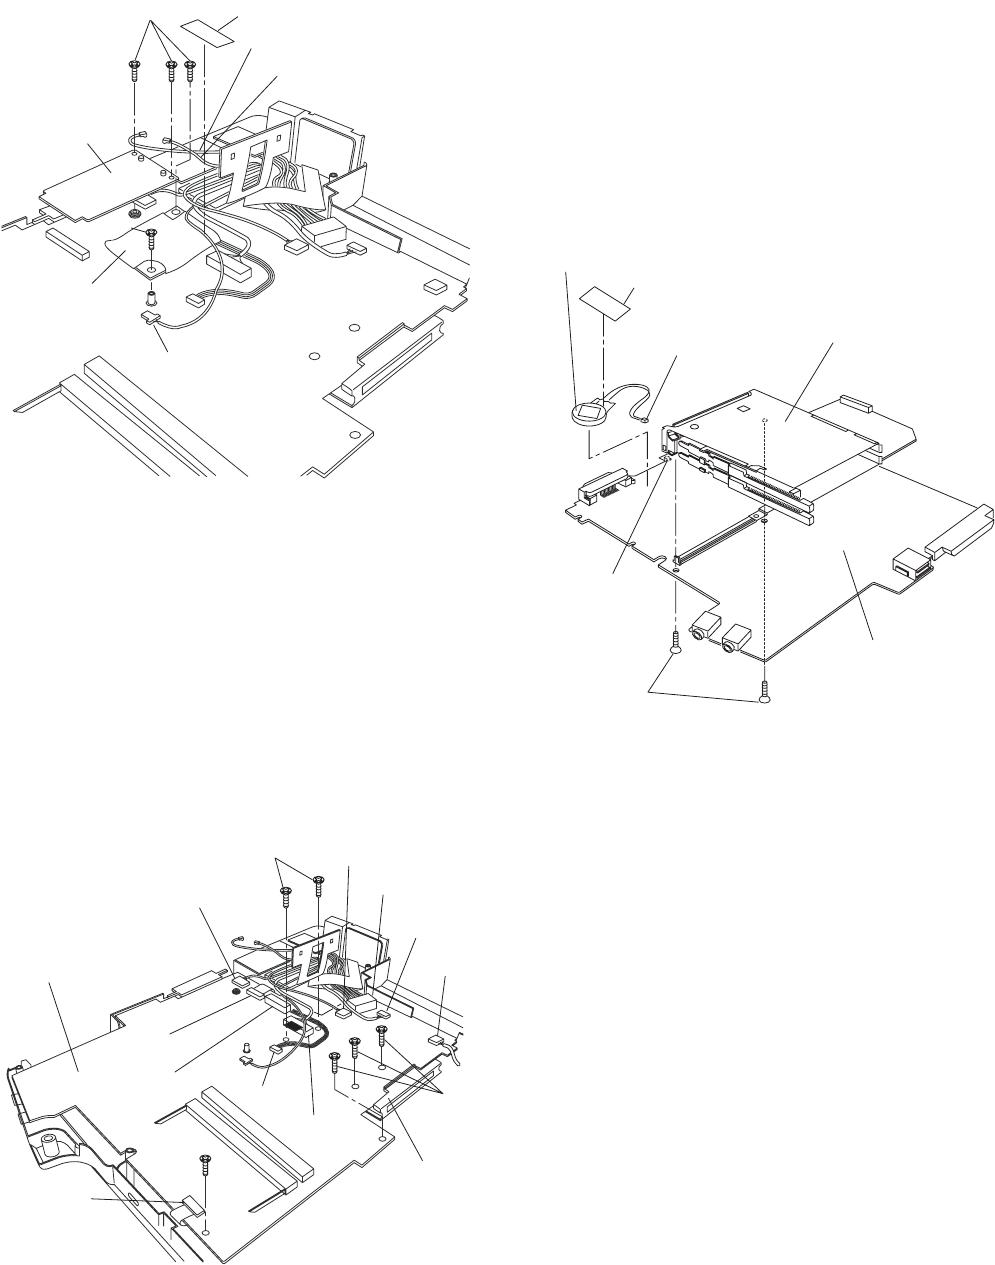 Panasonic CF-74JCJBD1 M 9.1.9. Removing the Wireless